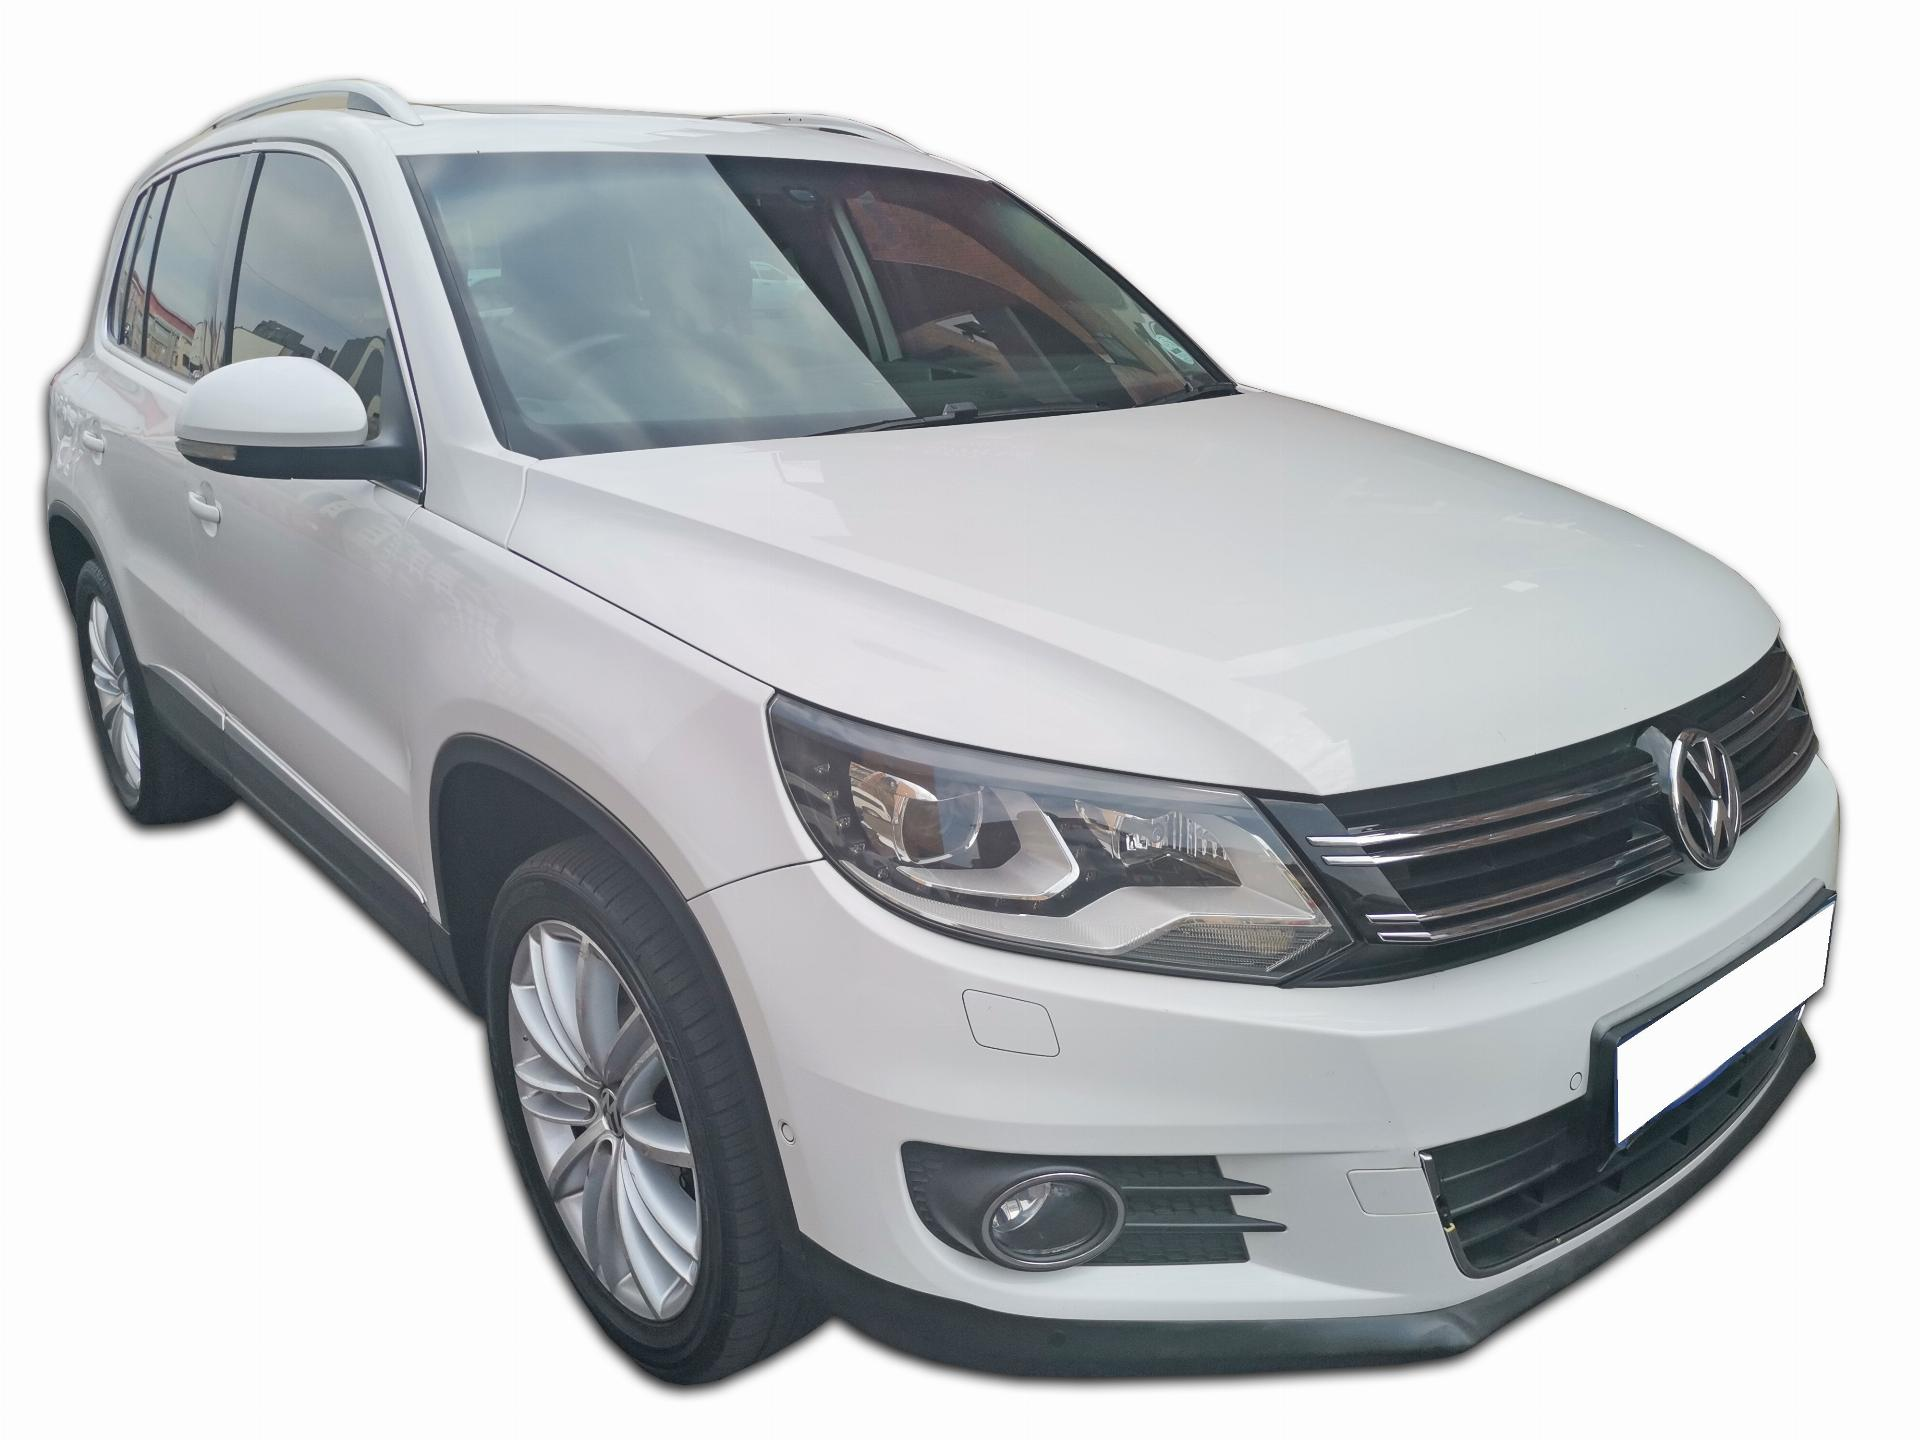 Volkswagen Tiguan 2.0 Tsi DSG 4 Motion